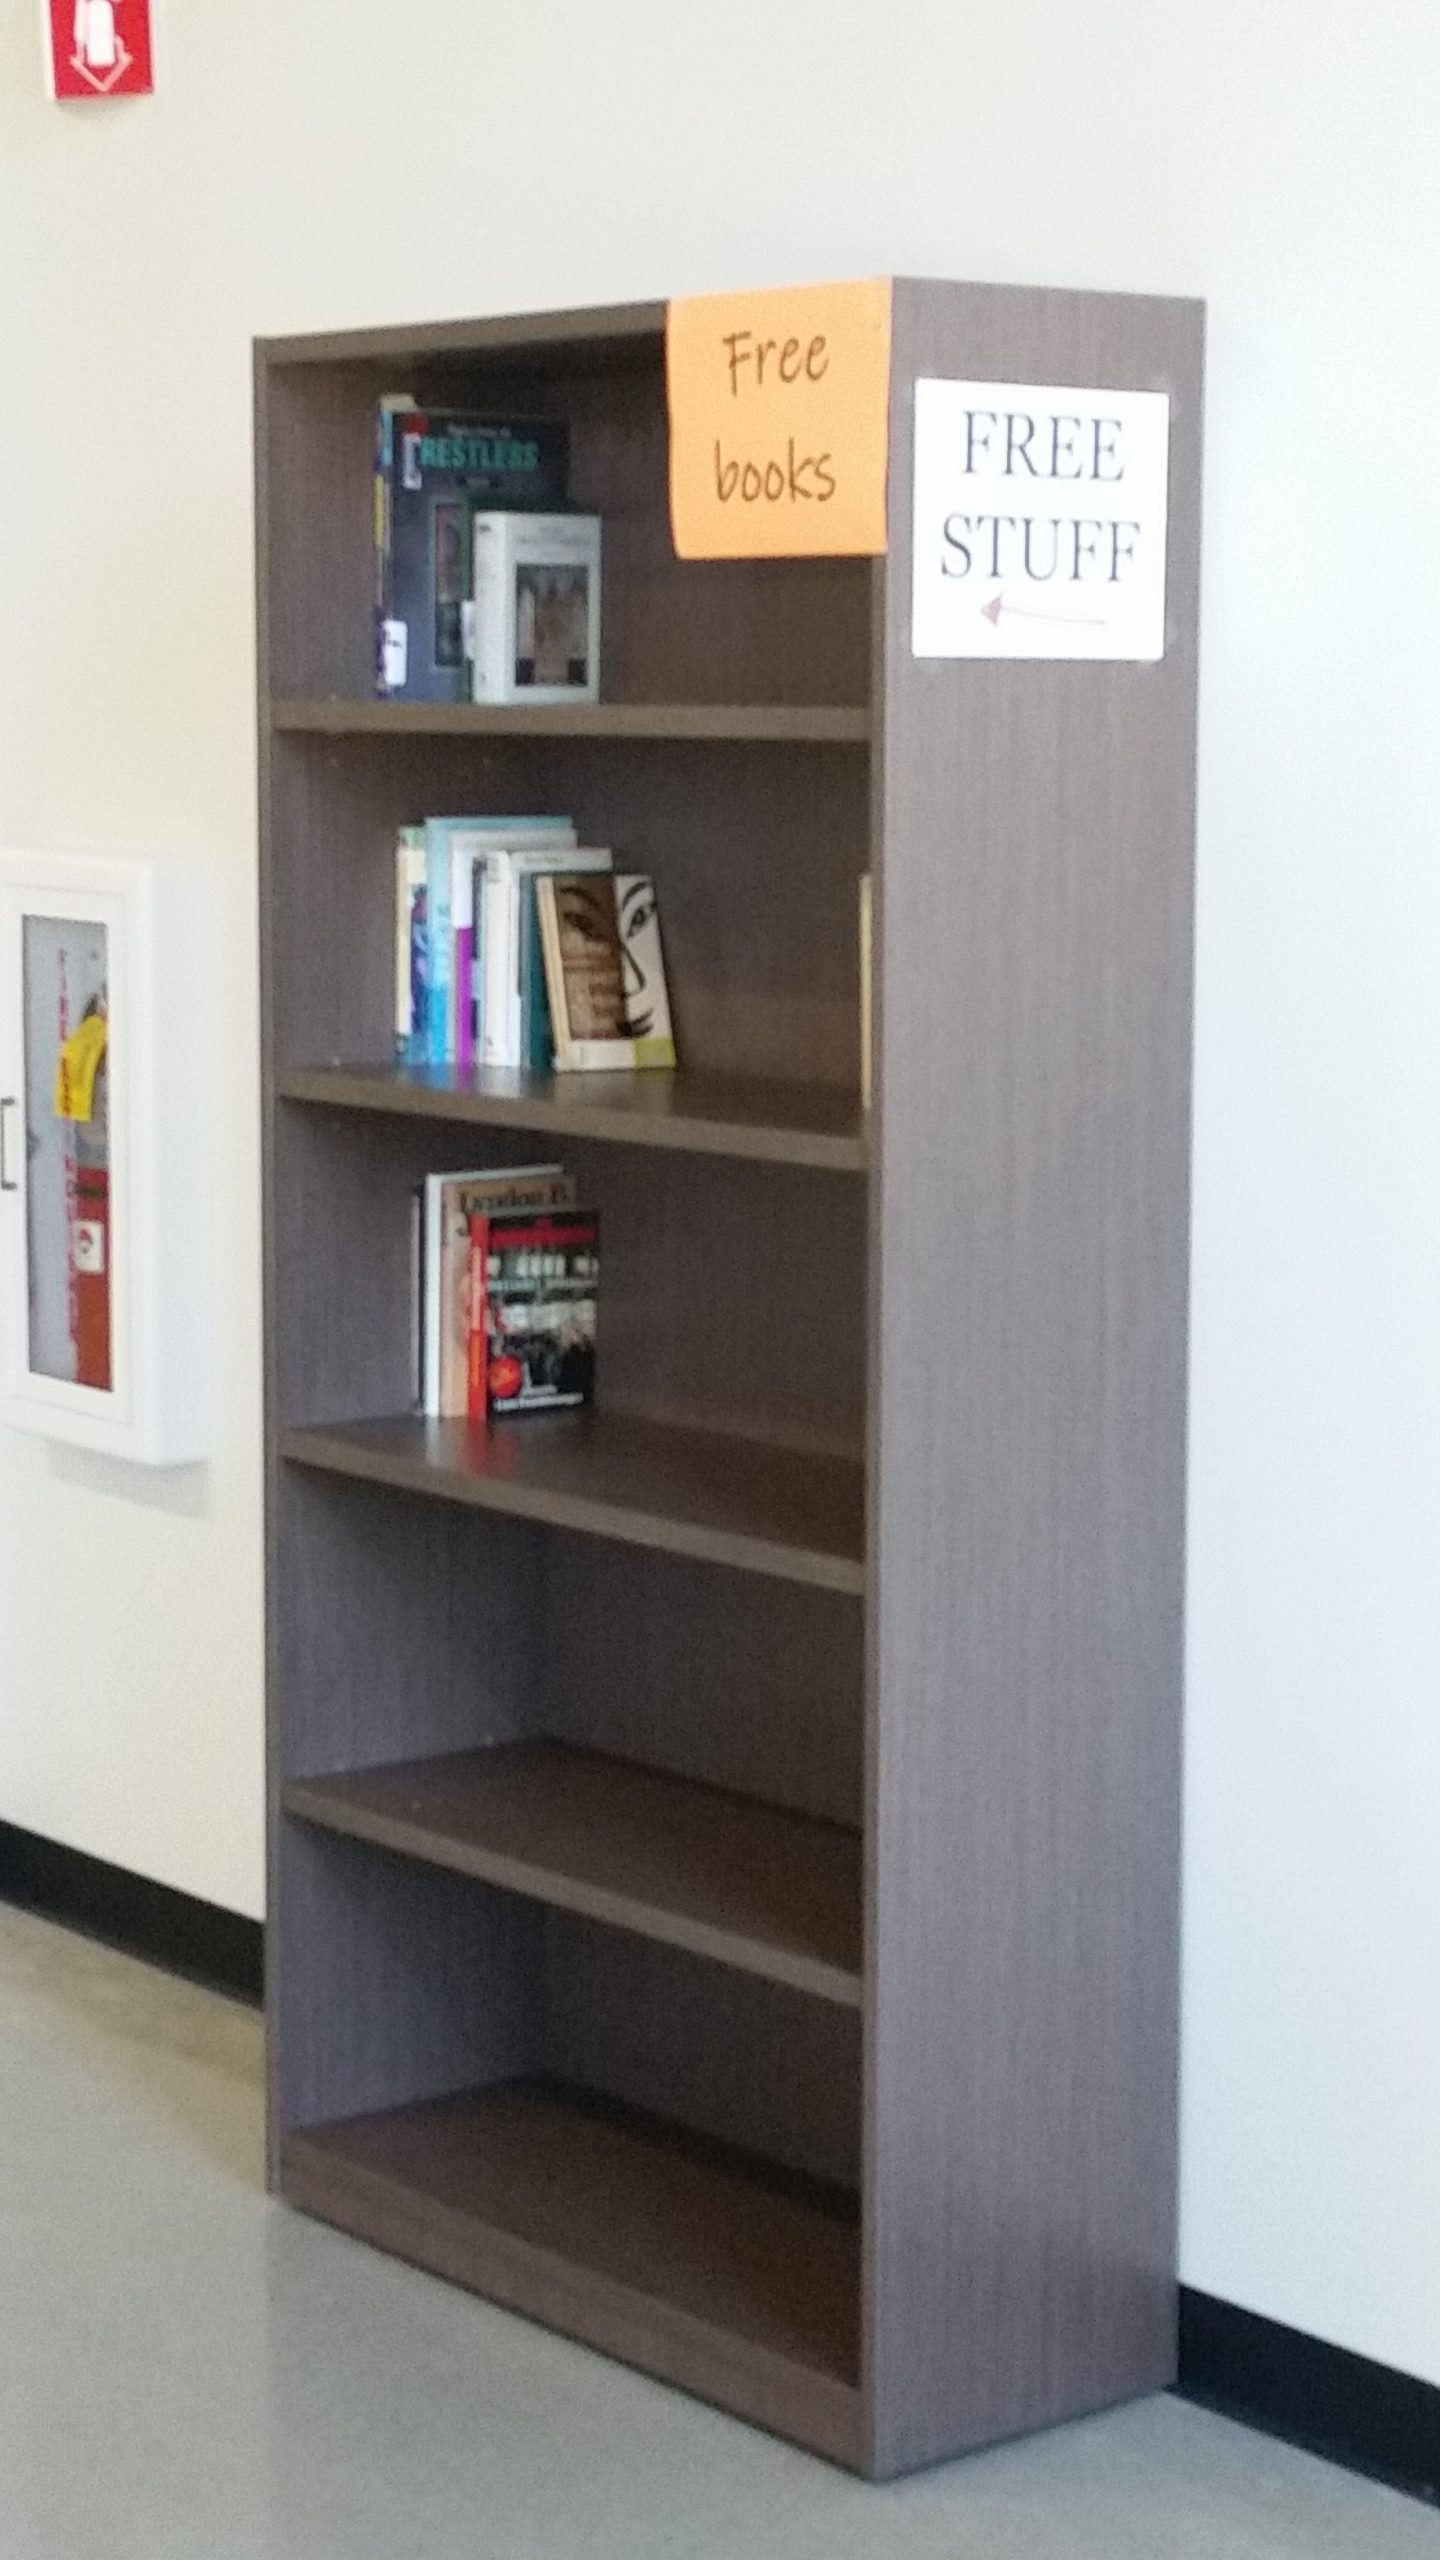 Free books bookshelf